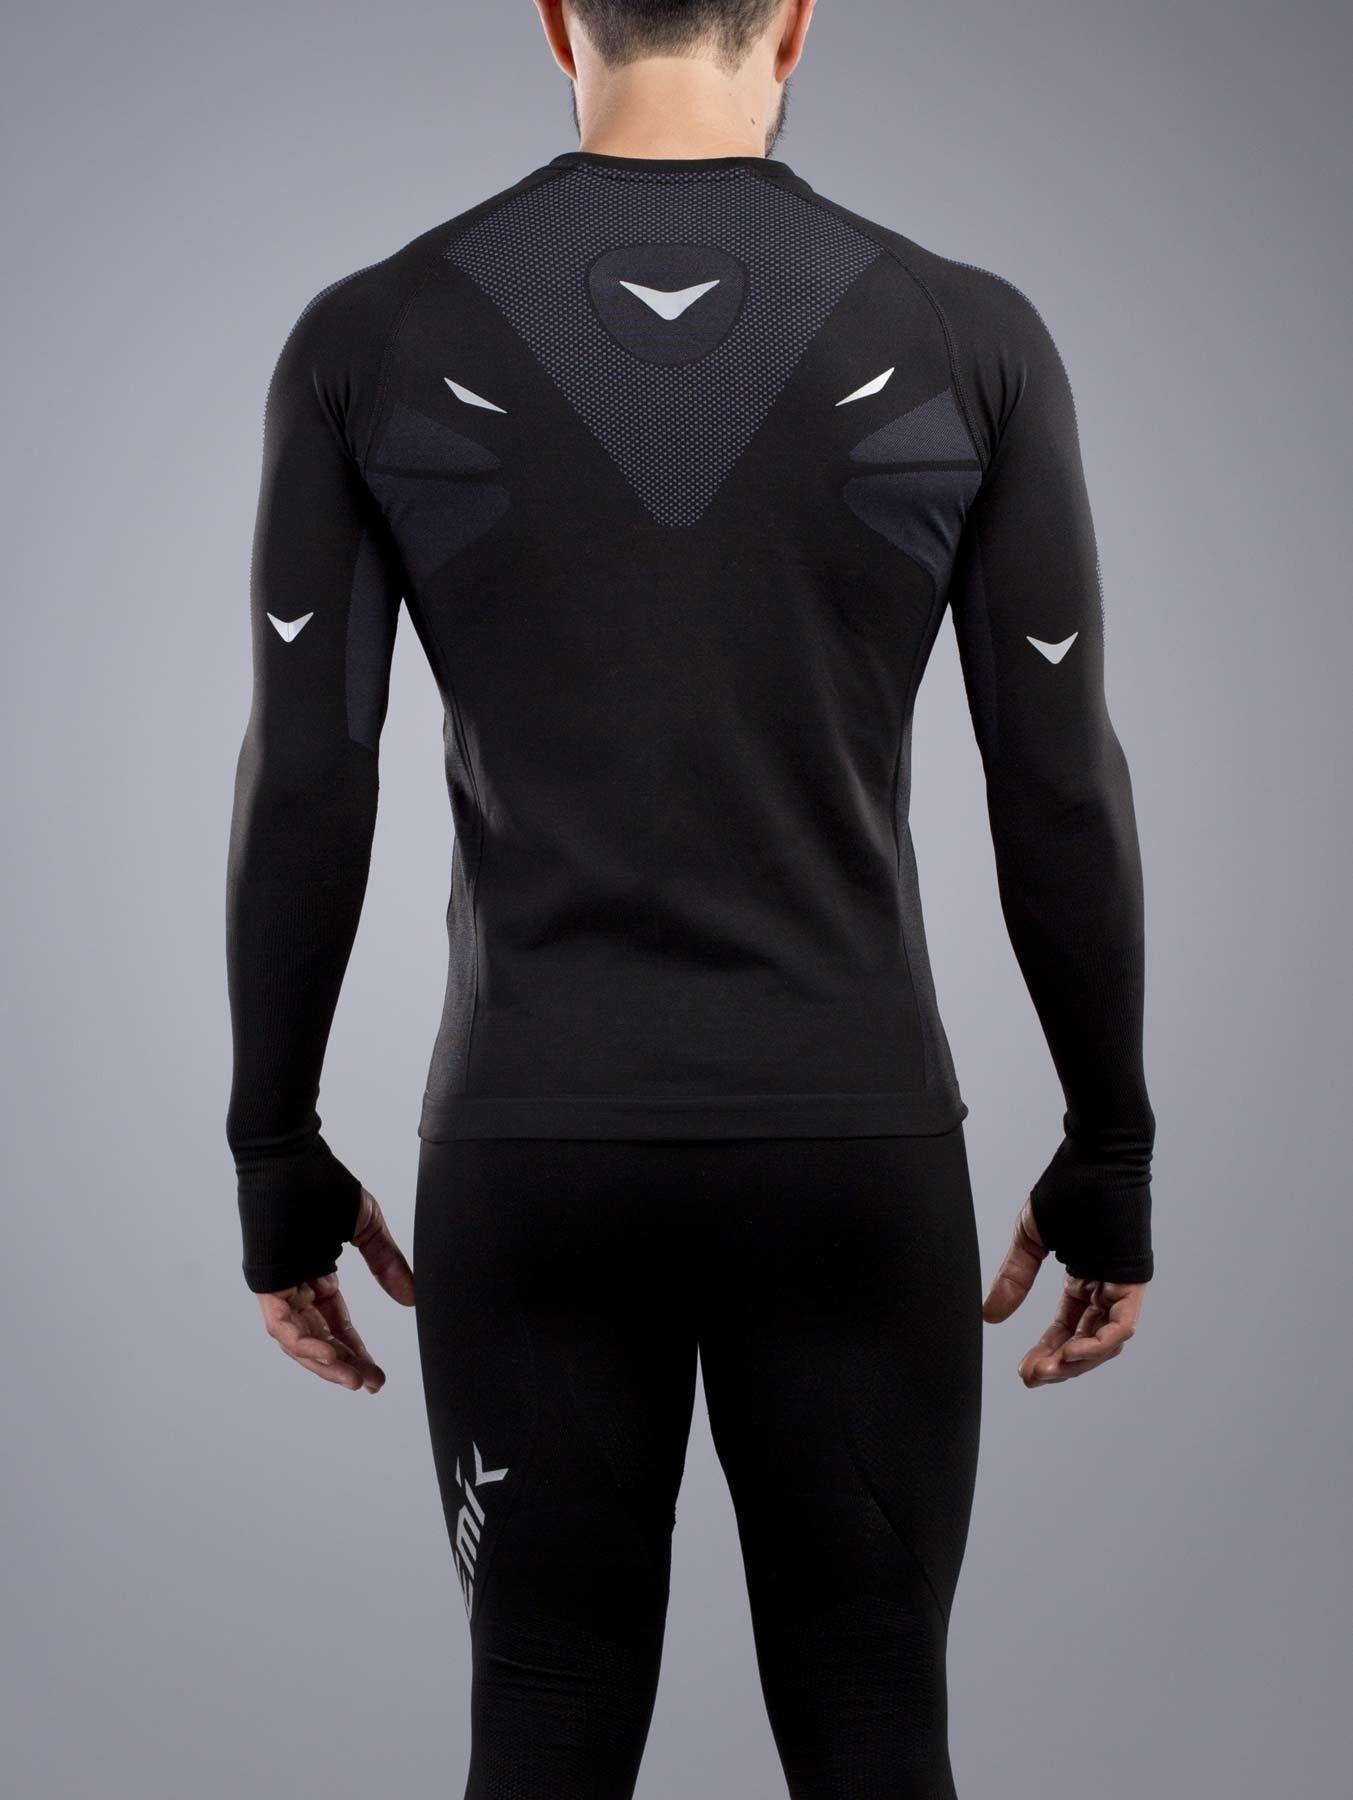 PLAYERA DEPORTIVA MANGA LARGA CABALLERO Nemik  longsleeve  tshirt  black   Nemik 38916044c575